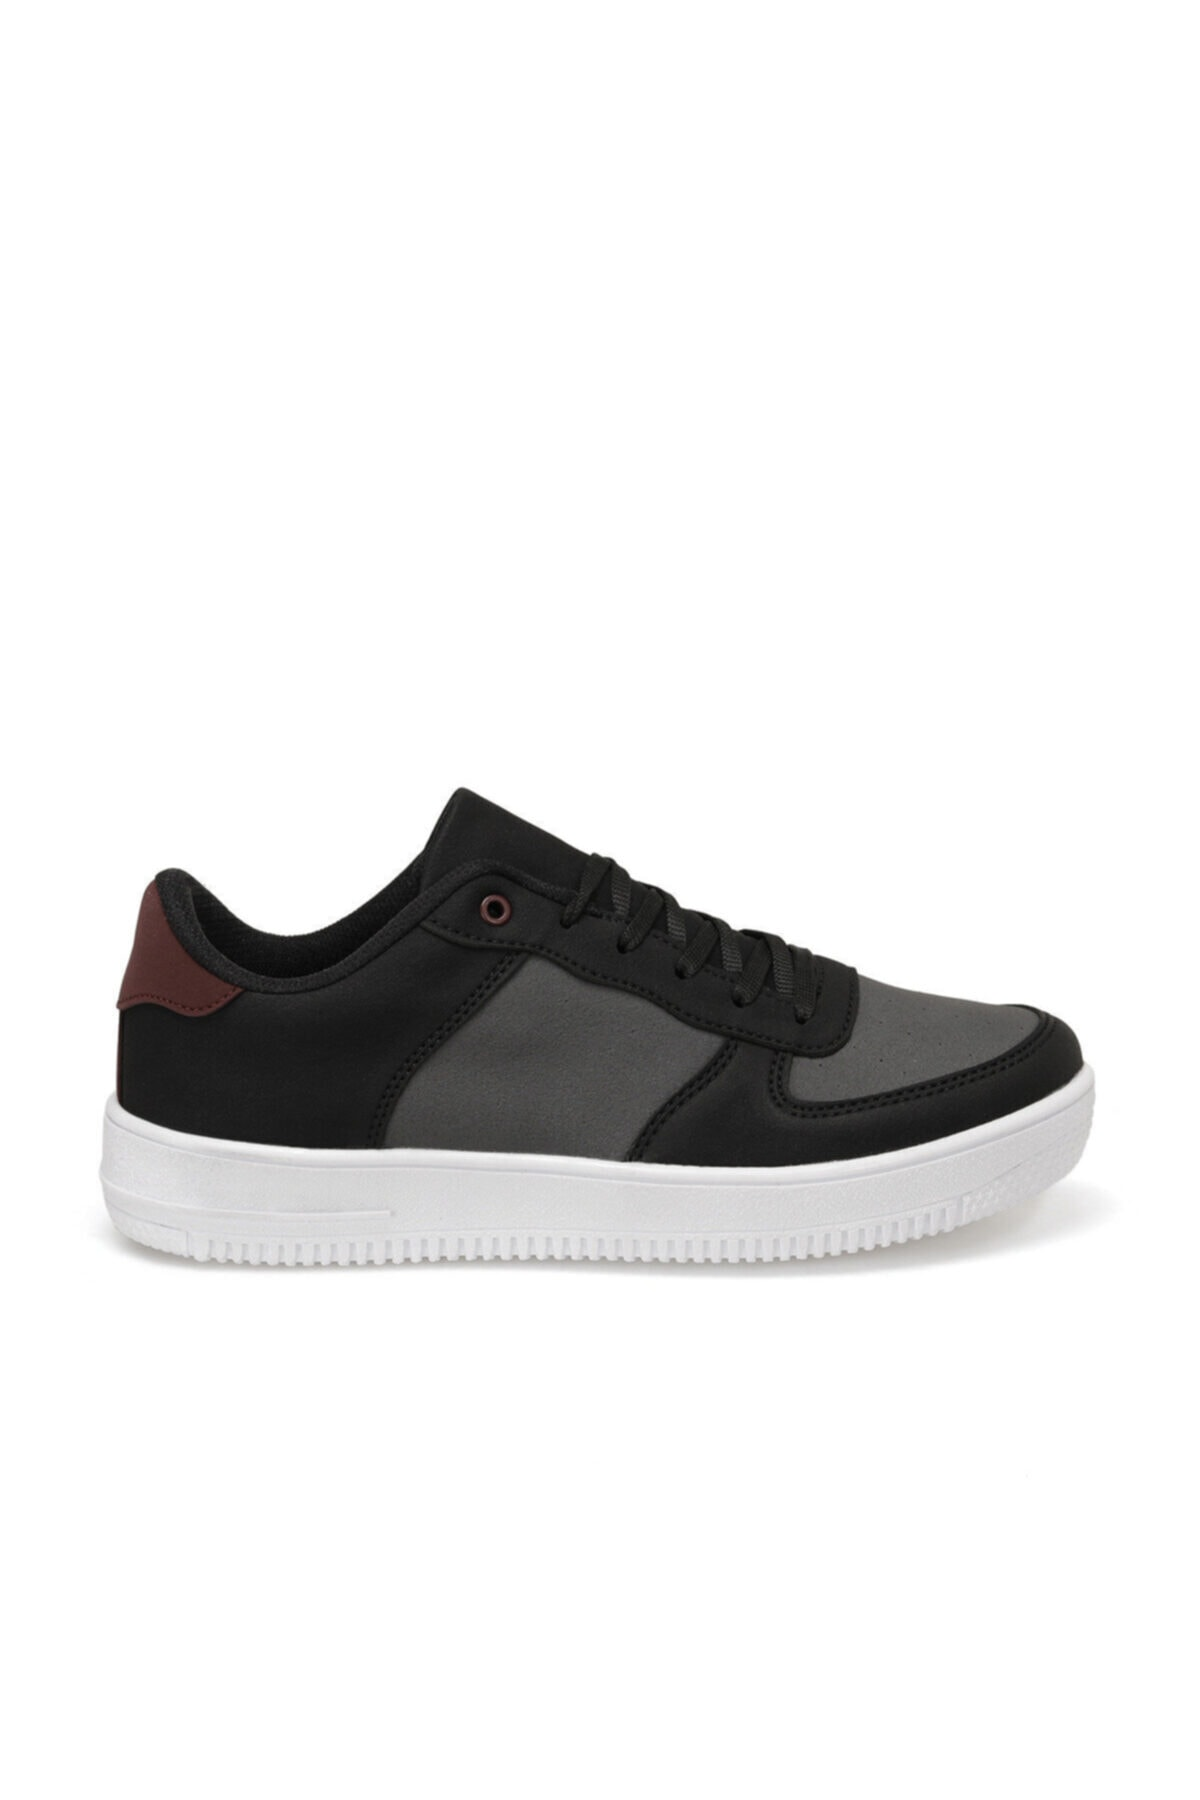 Torex DRAKE Gri Erkek Sneaker Ayakkabı 100576856 2